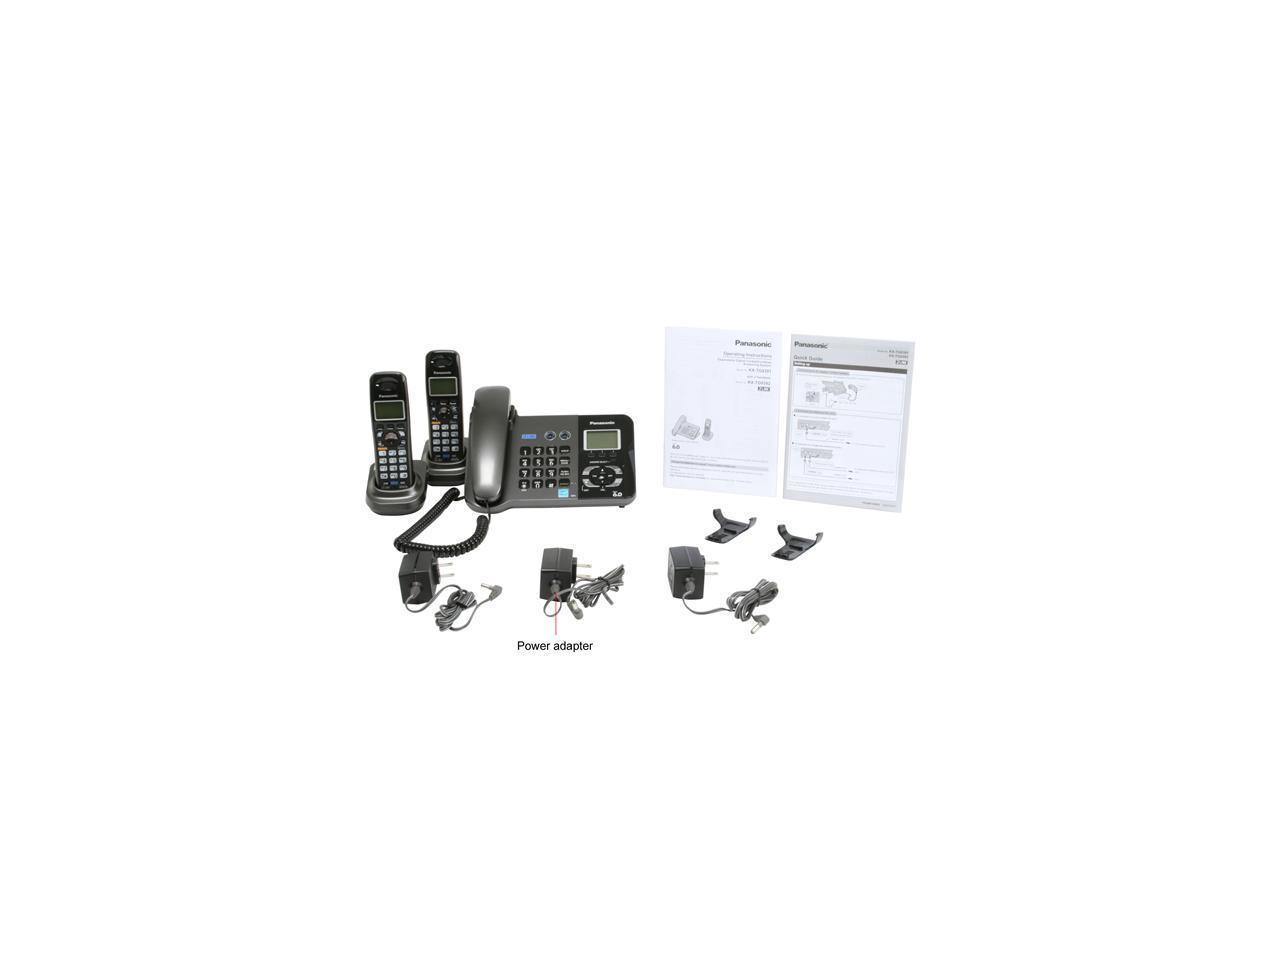 Panasonic KX-TG9392T 1.9 GHz Digital DECT 6.0 2X Handsets